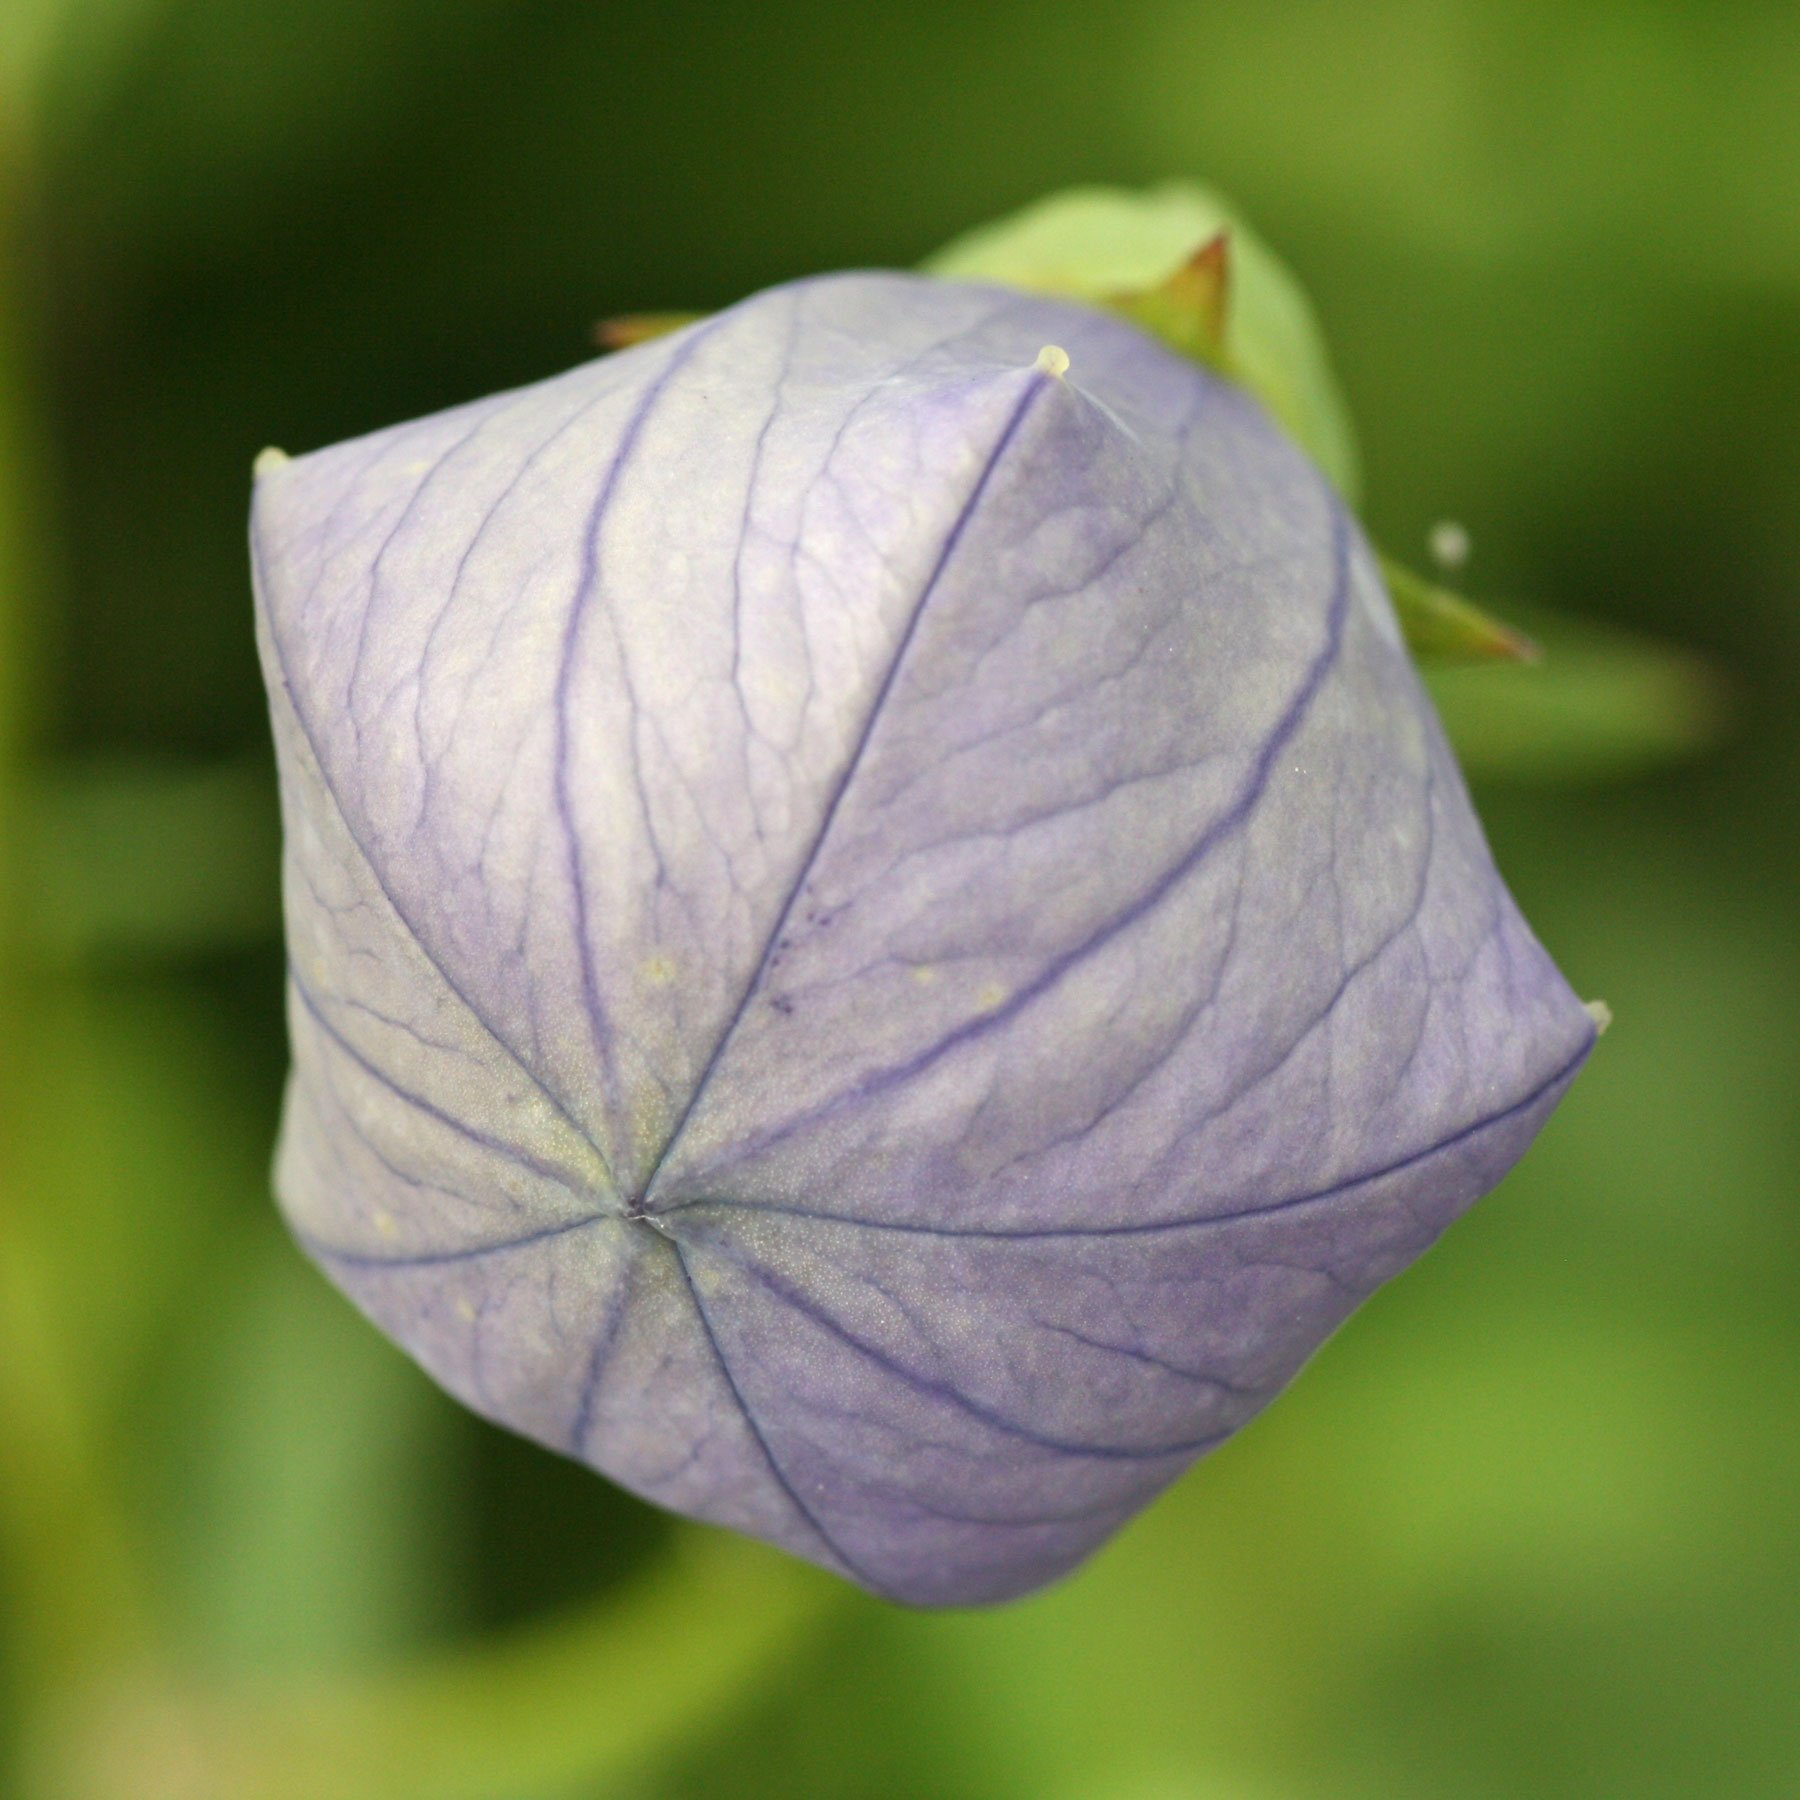 Platycodon flower bud